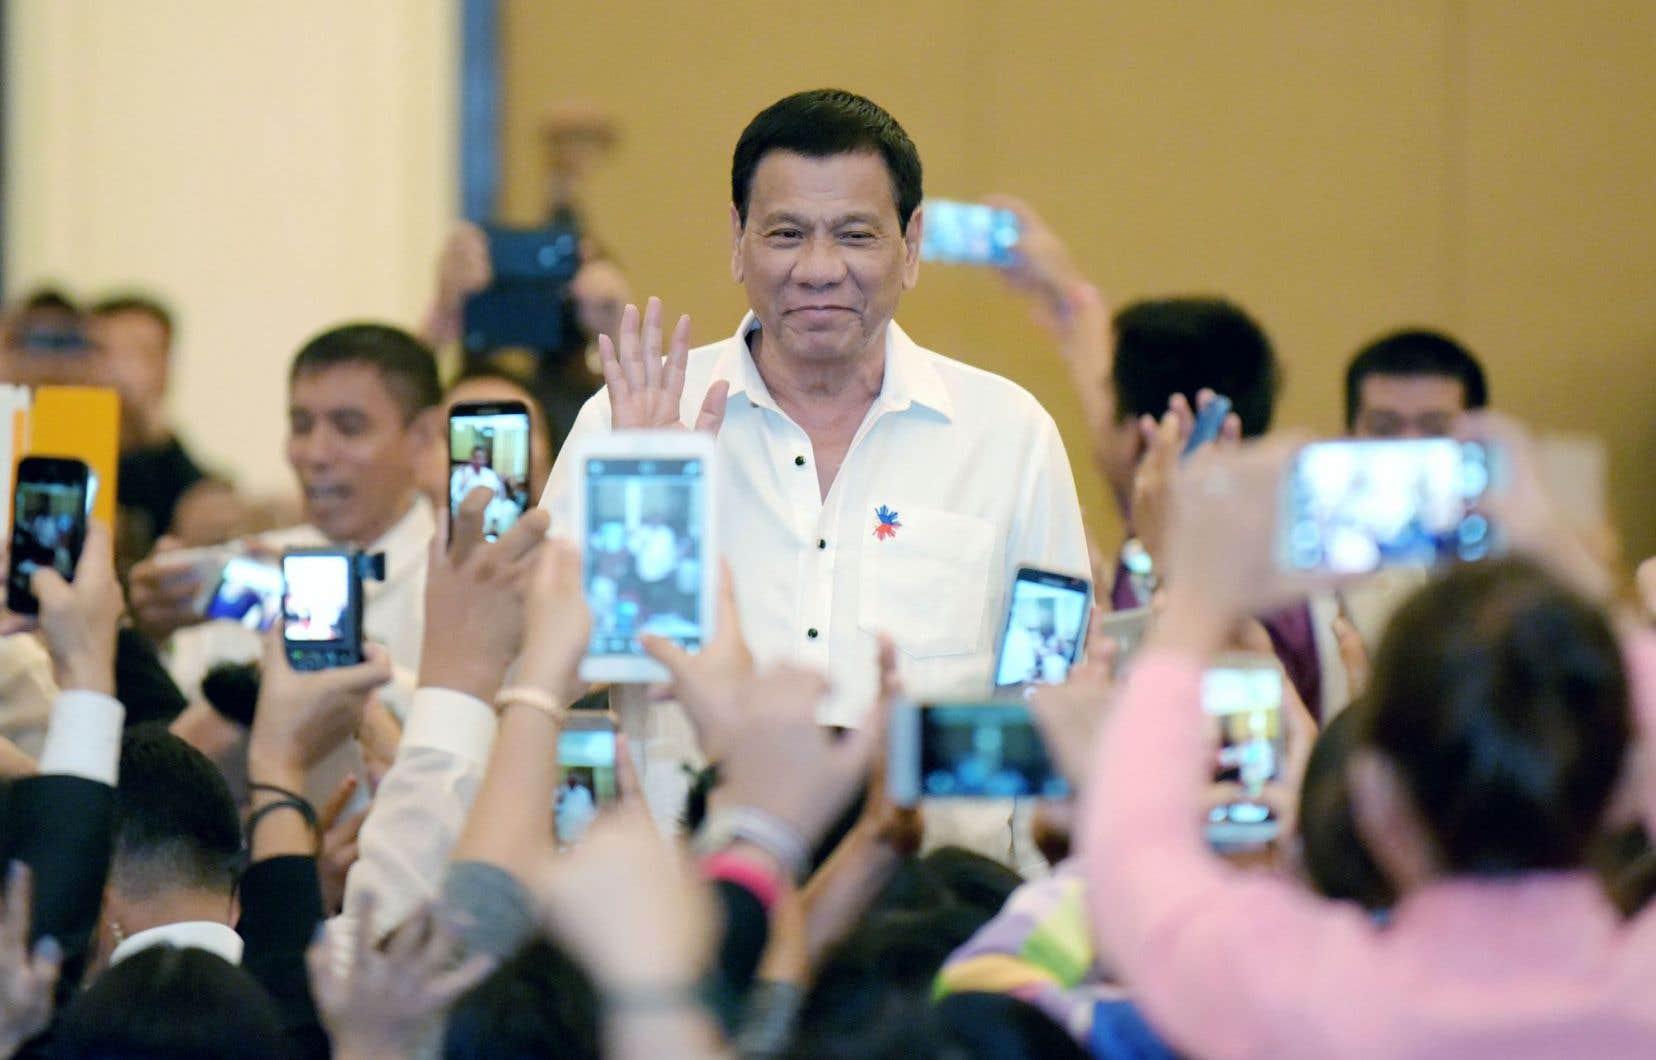 Le président philippin, Rodrigo Duterte